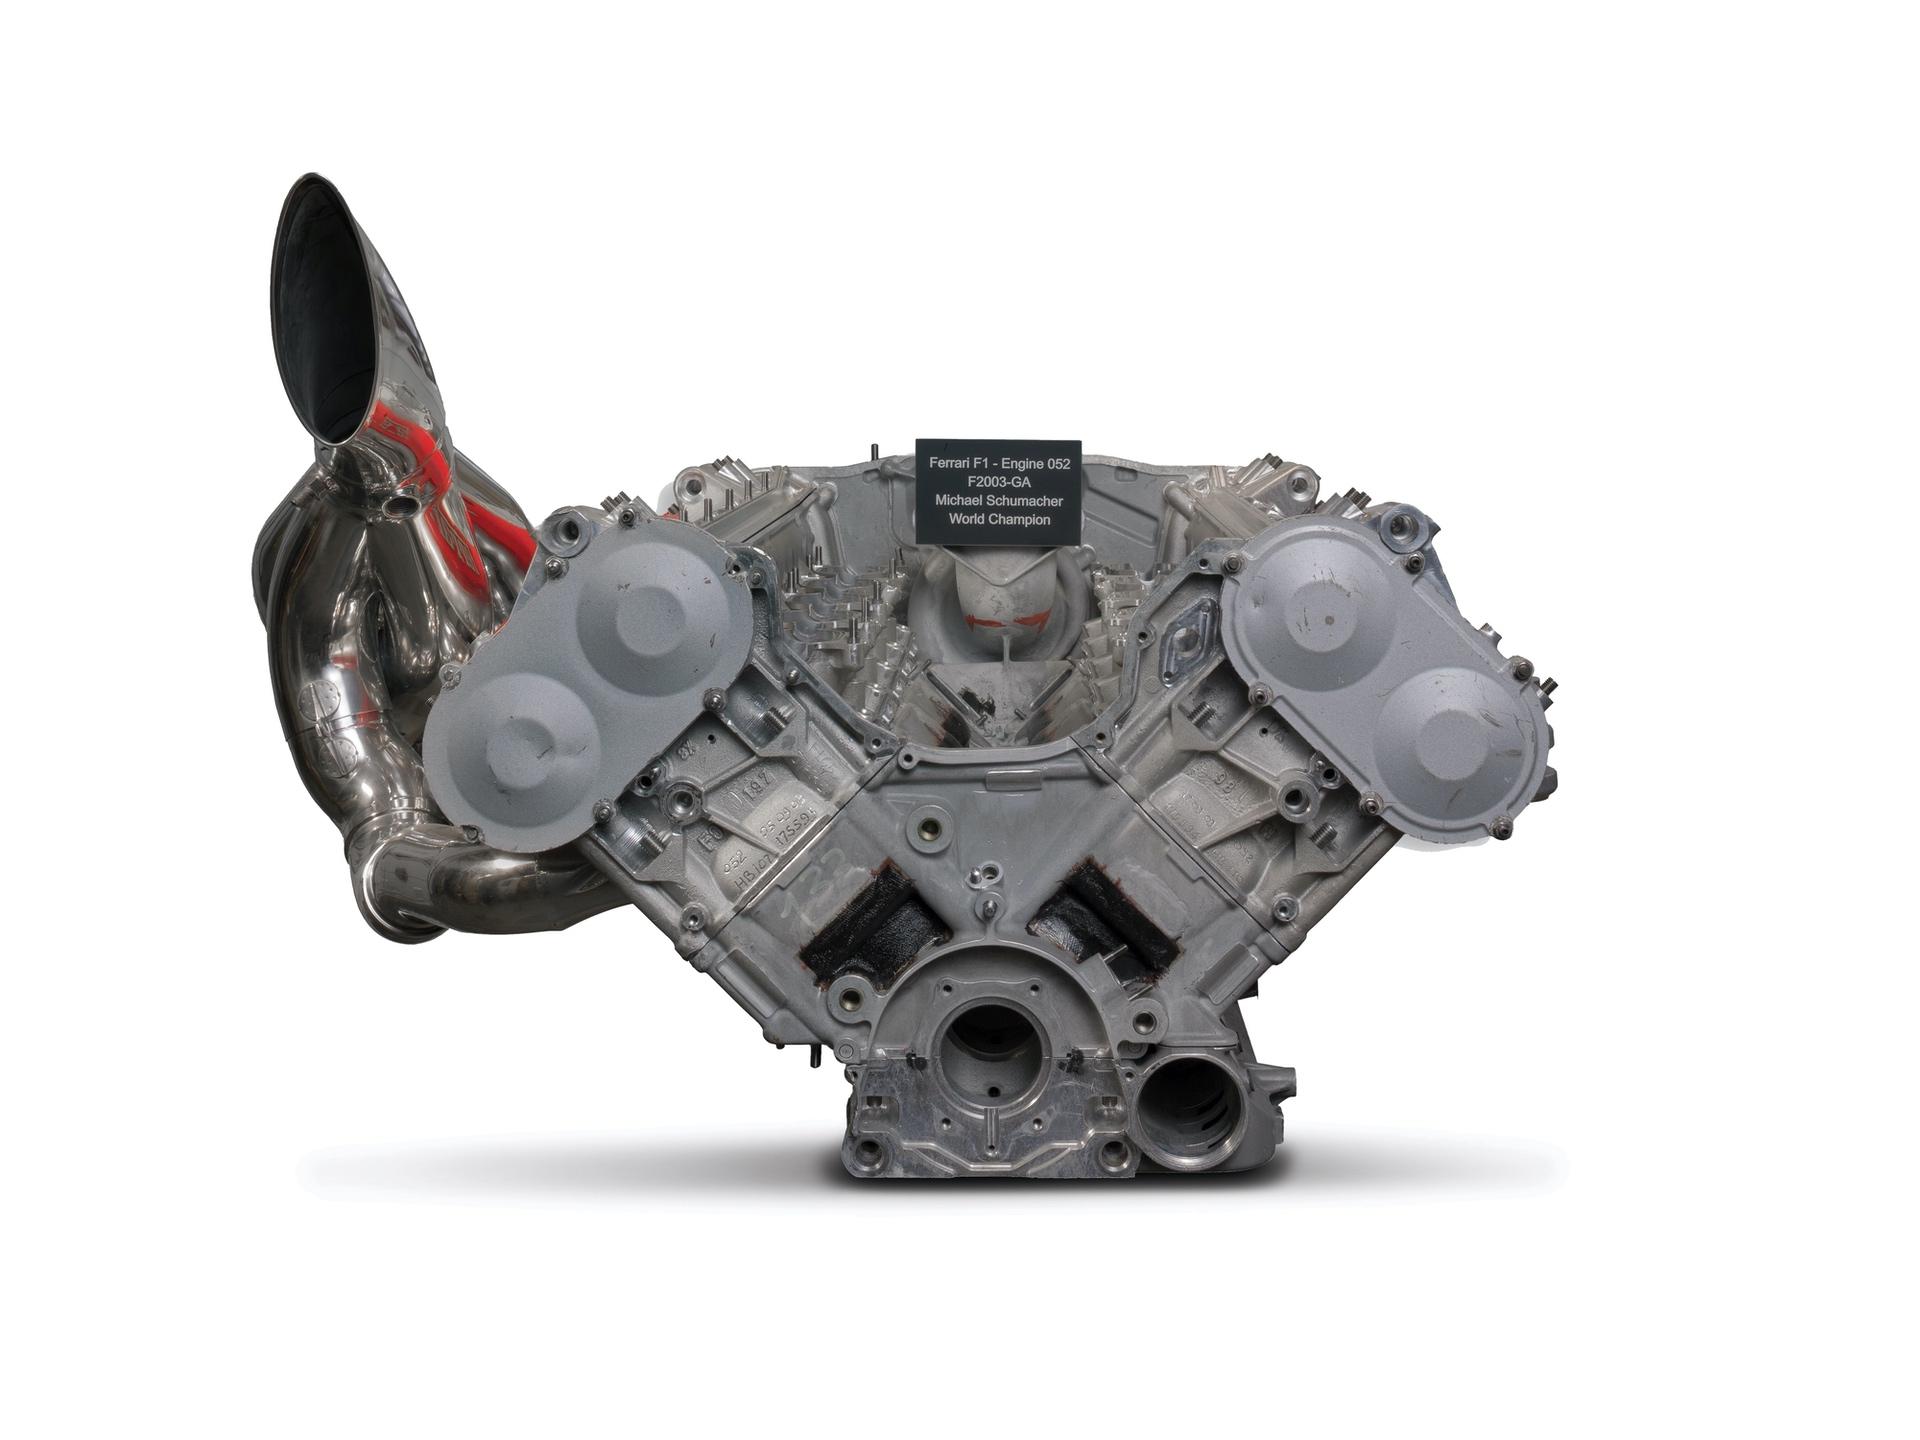 Ferrari_F2003-GA_Engine_0000